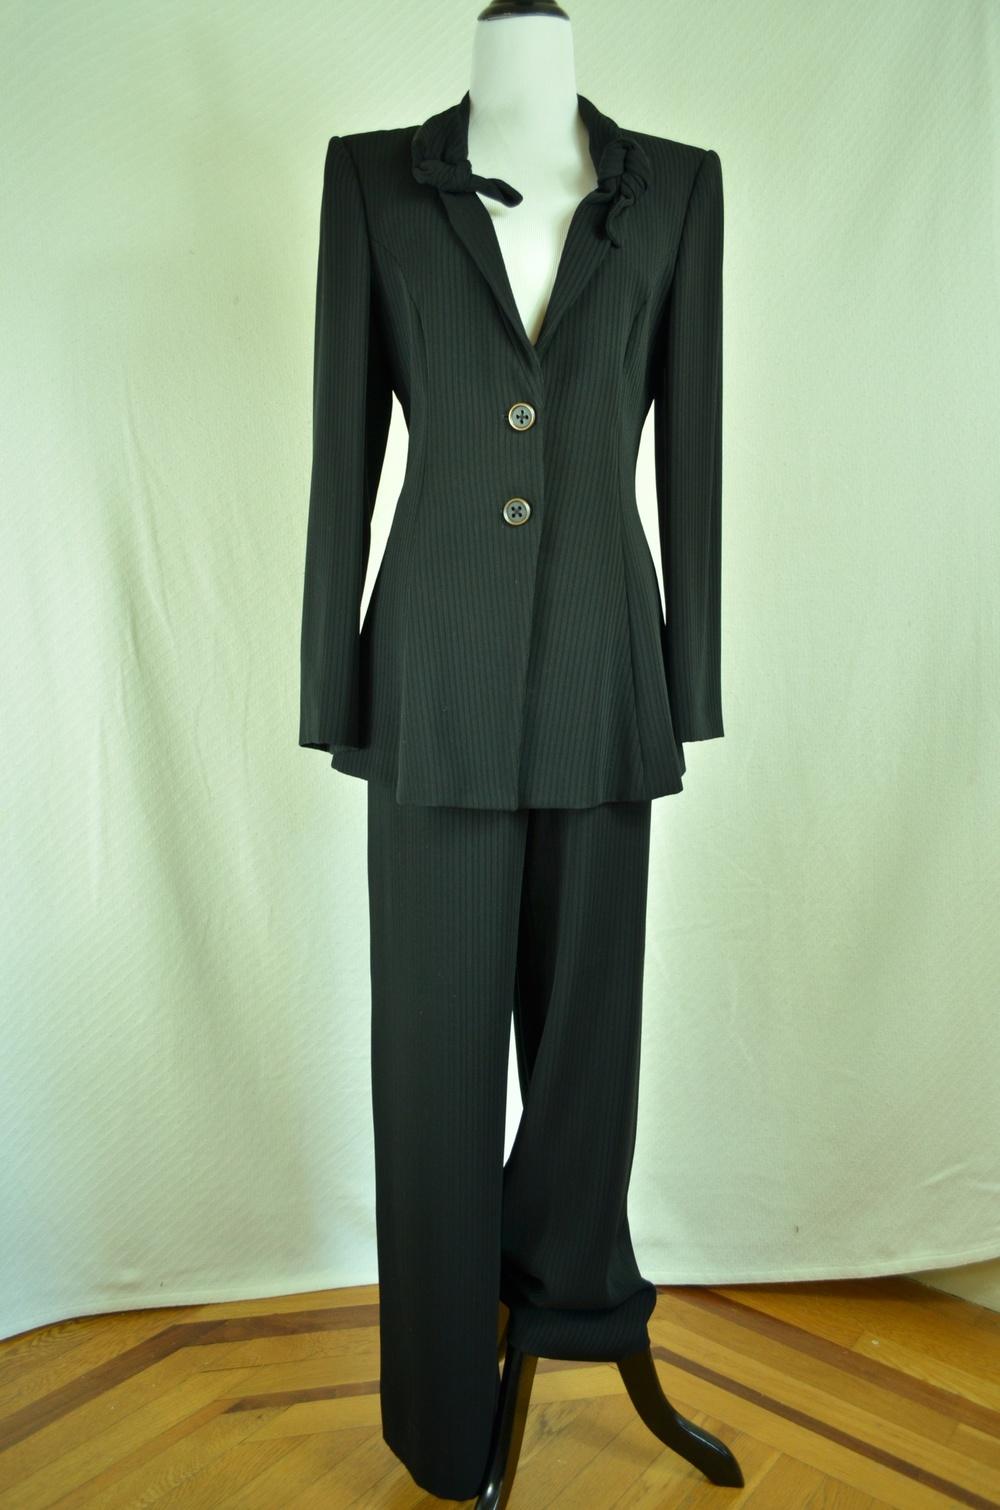 46. Giorgio Armani Tie-Front Suit